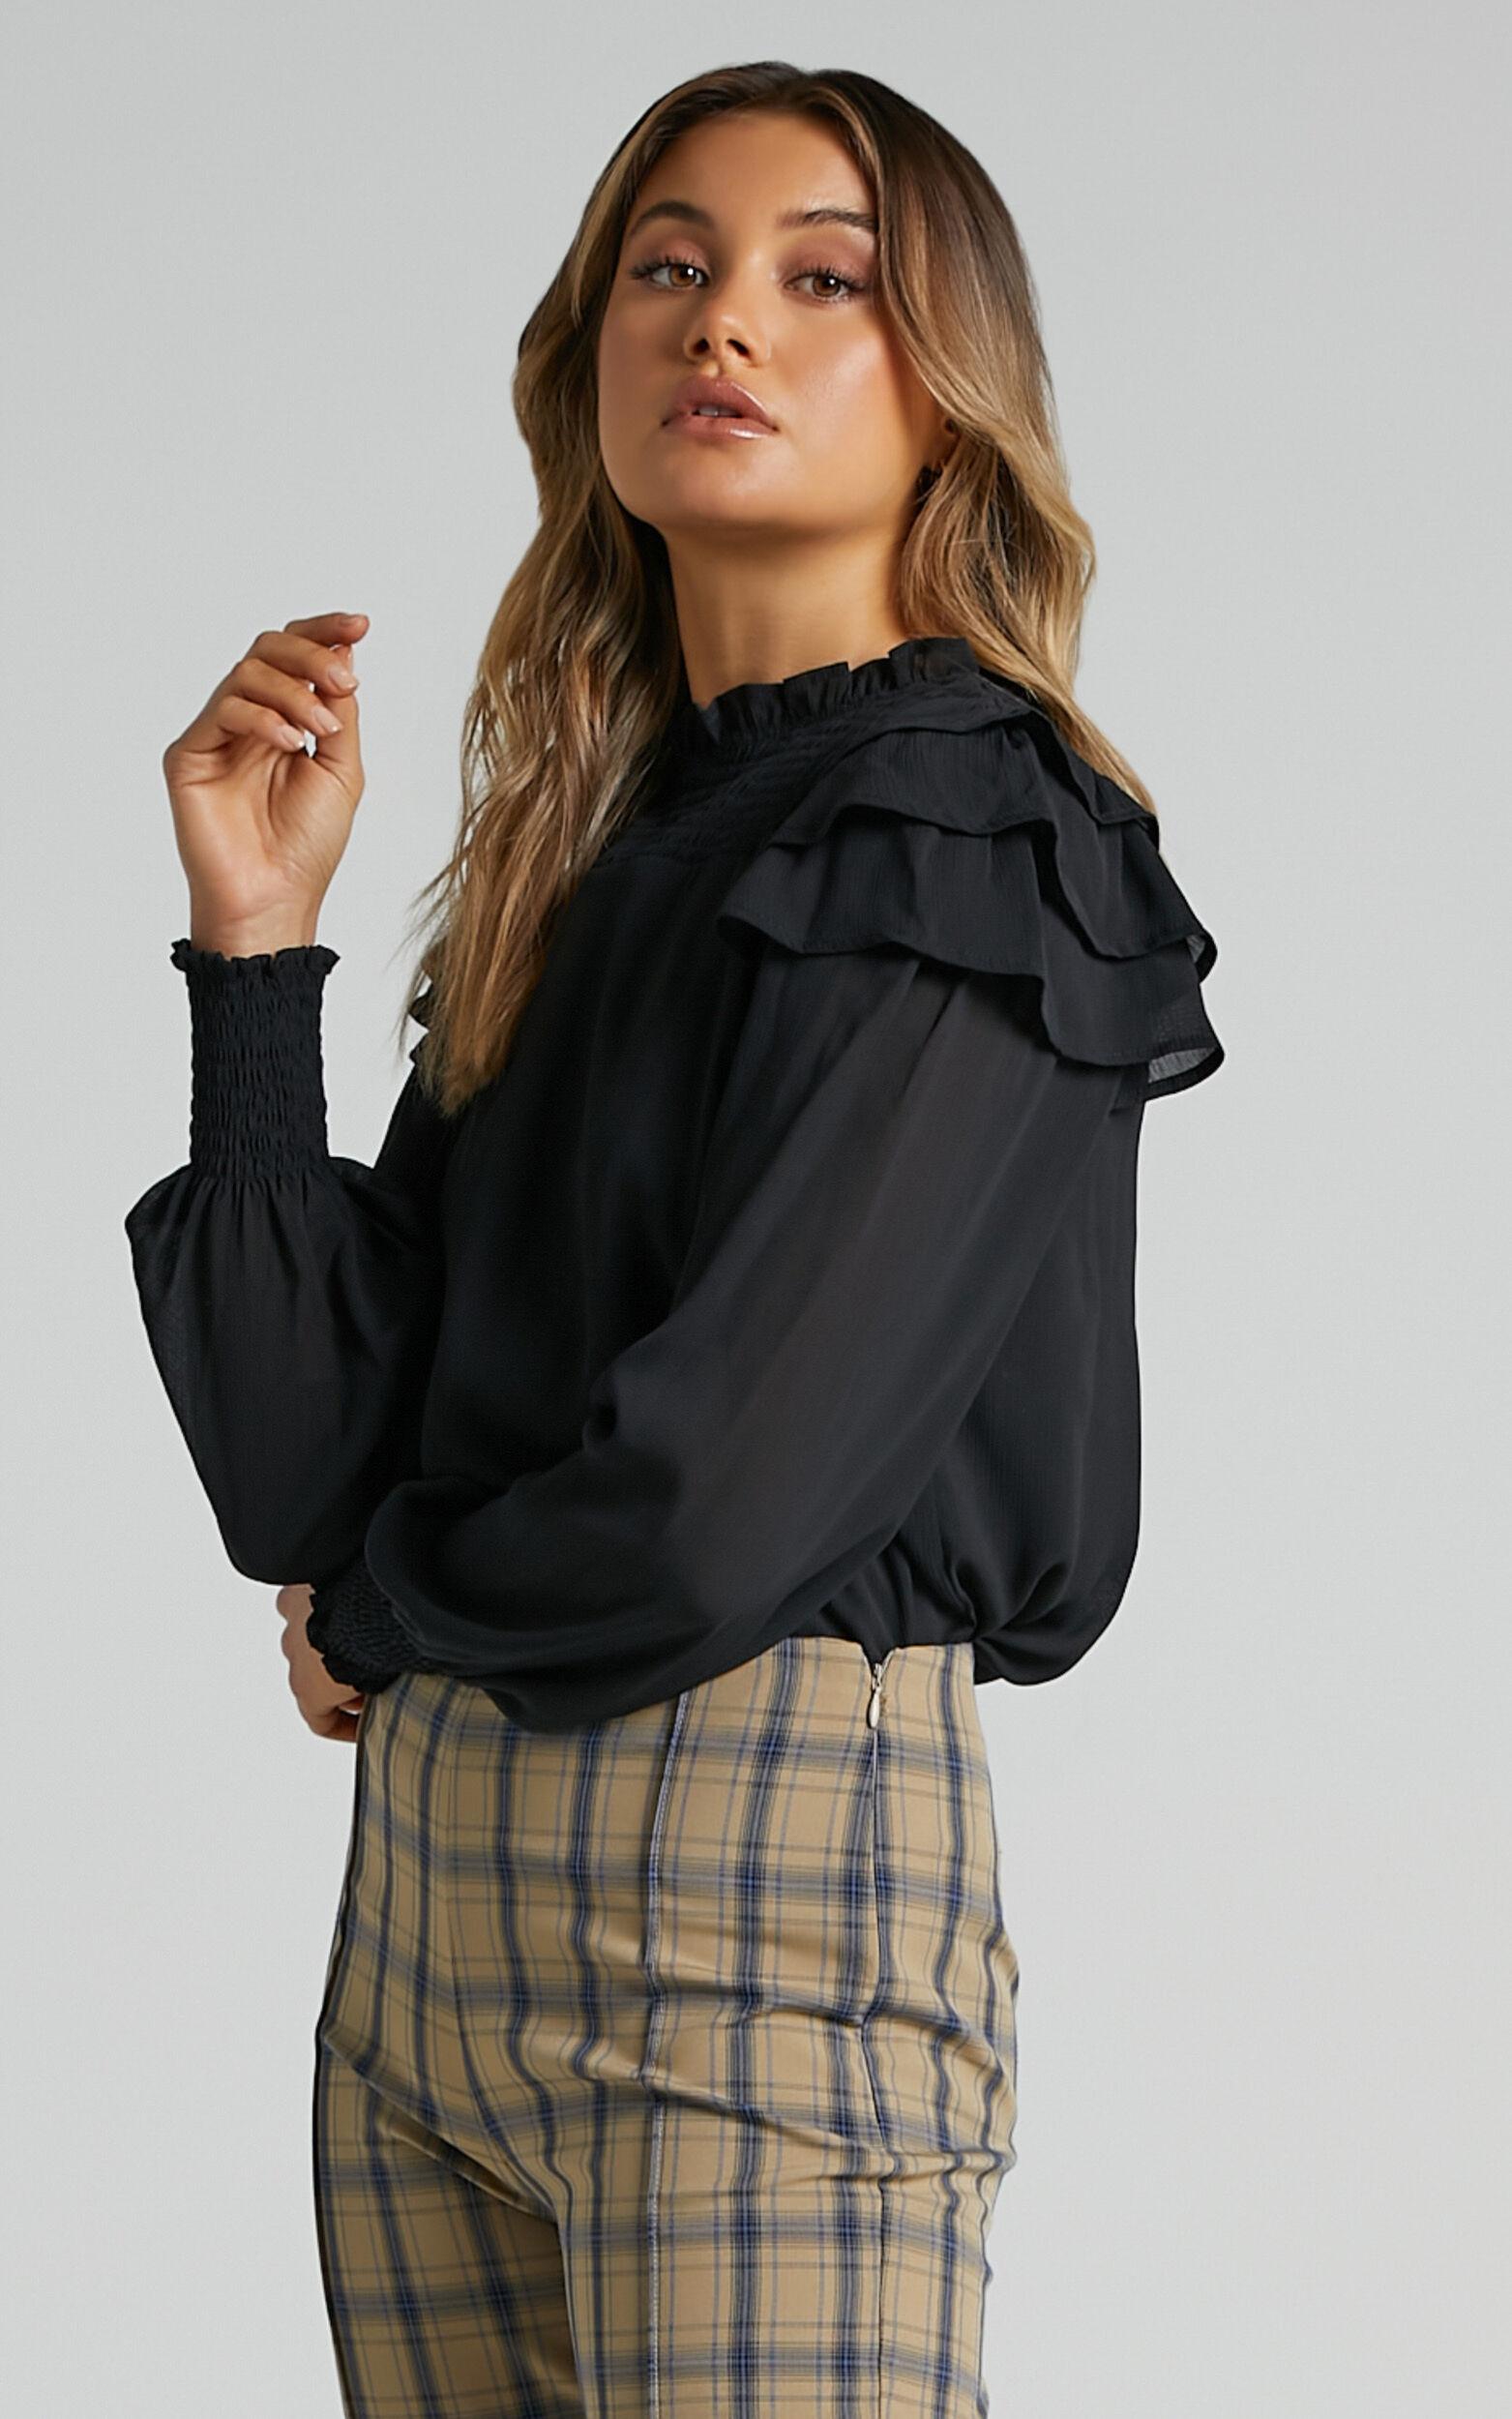 Zenobia Longsleeve Ruffle Top in Black - 04, BLK1, super-hi-res image number null